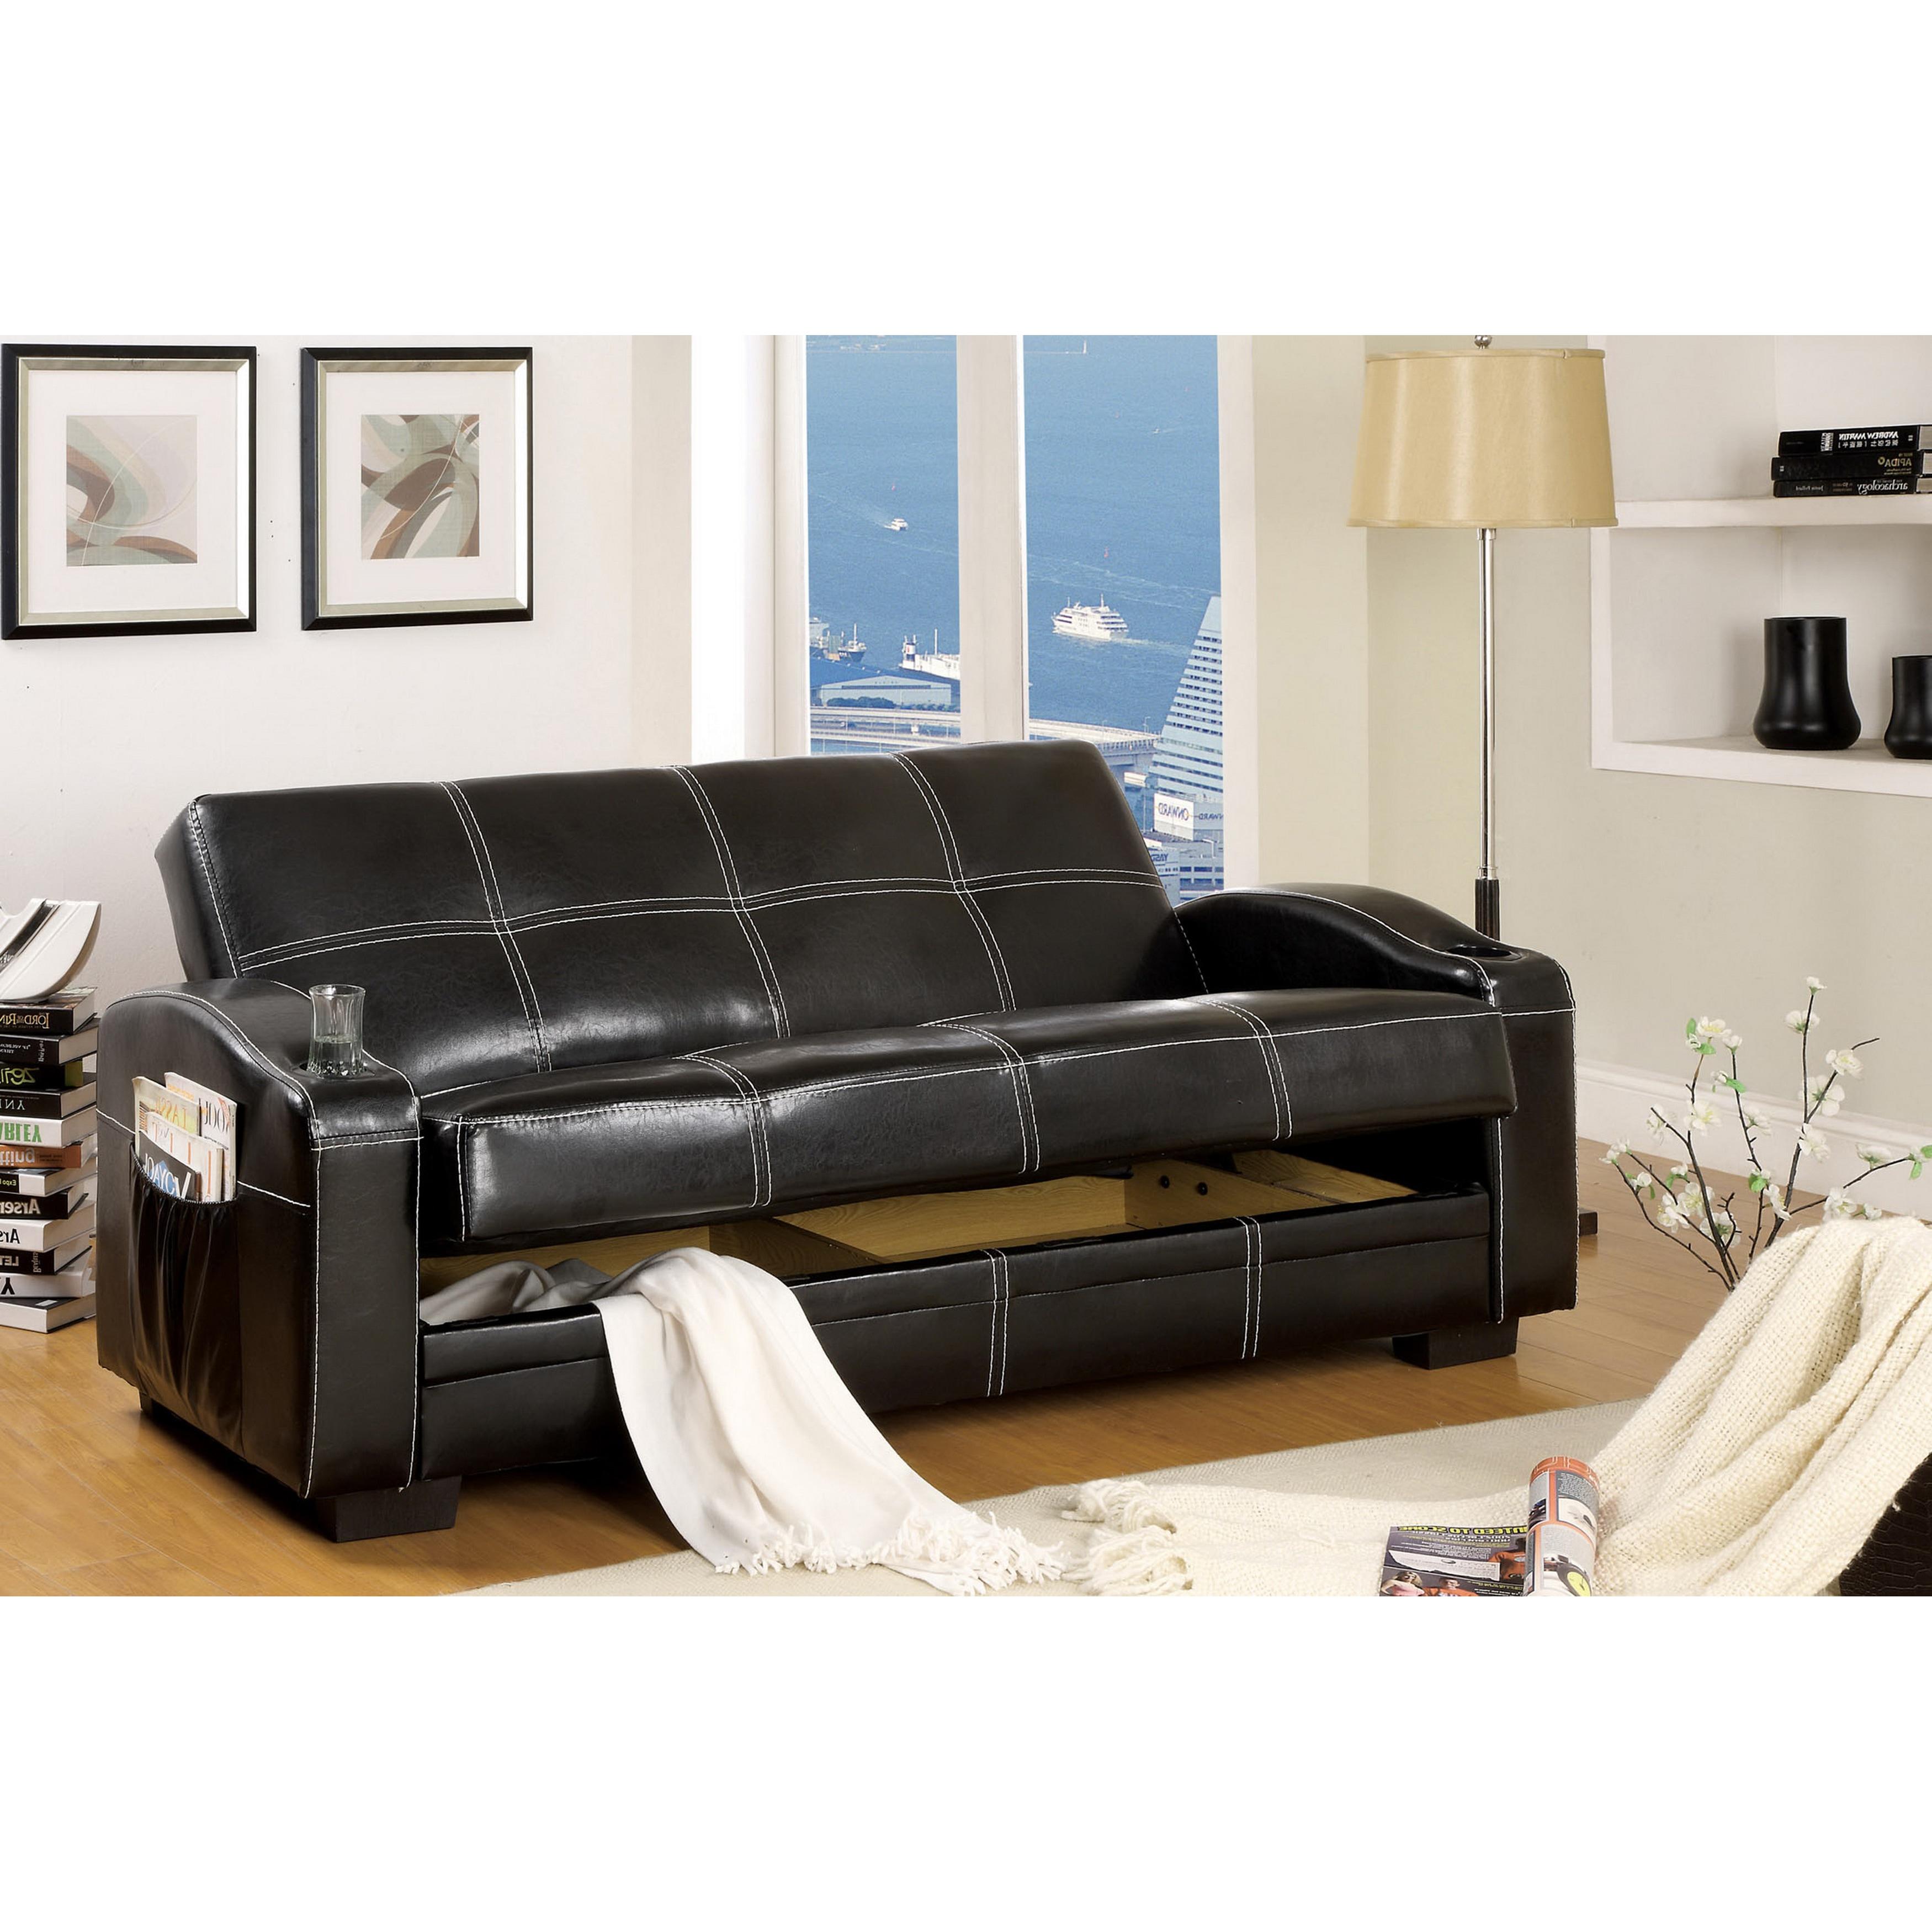 Modern Black Faux Leather Futon